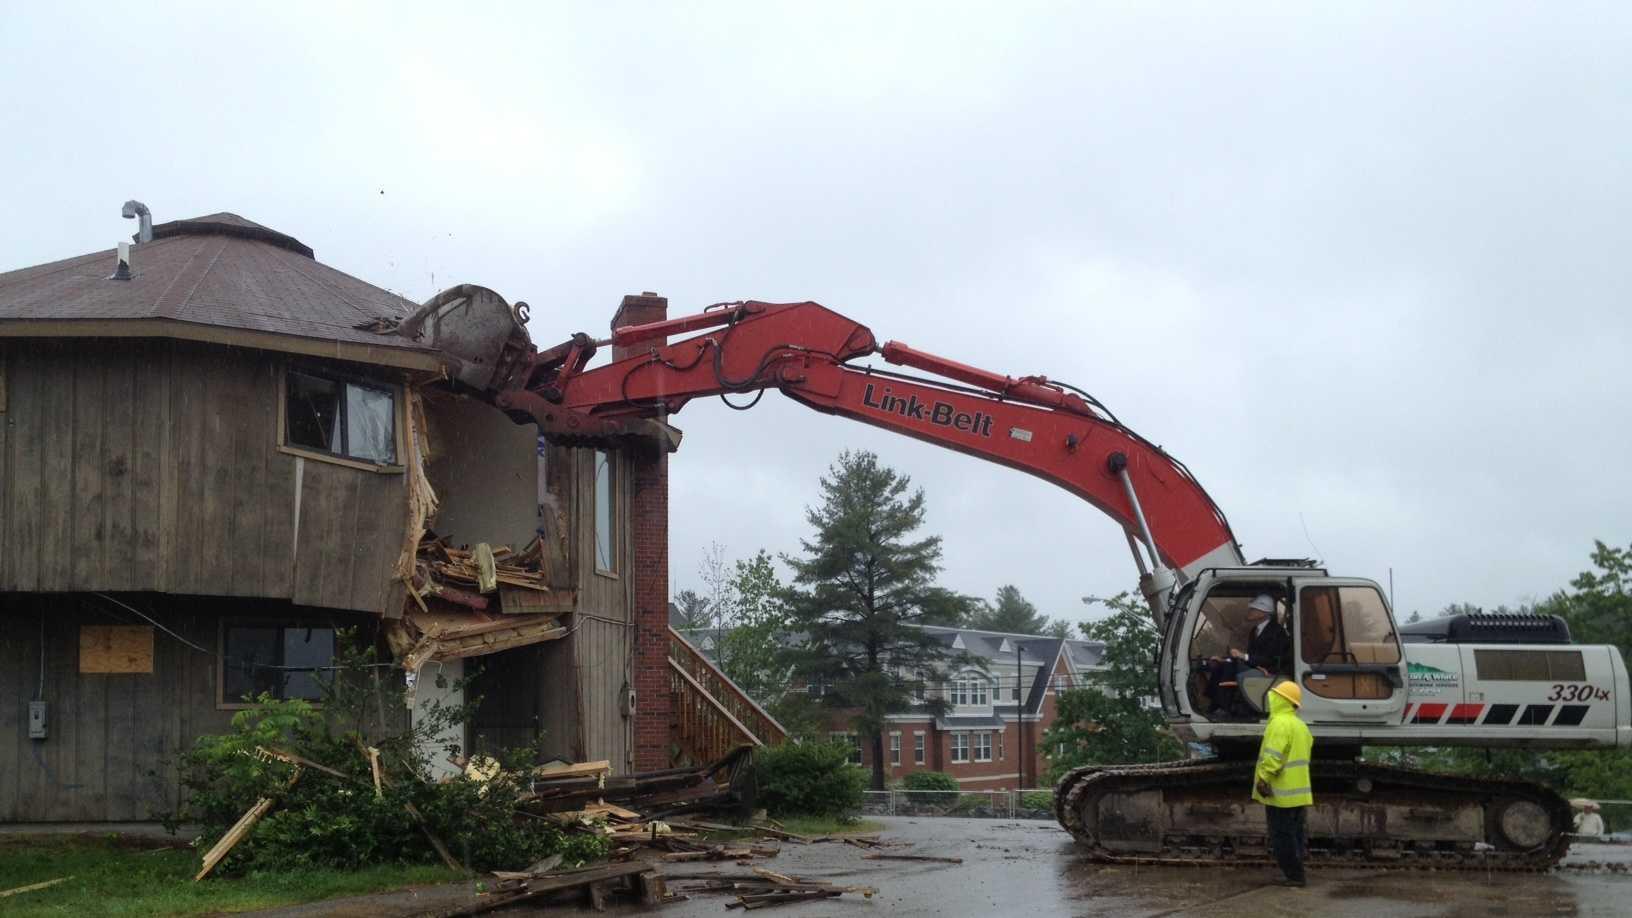 SNHU president demolition